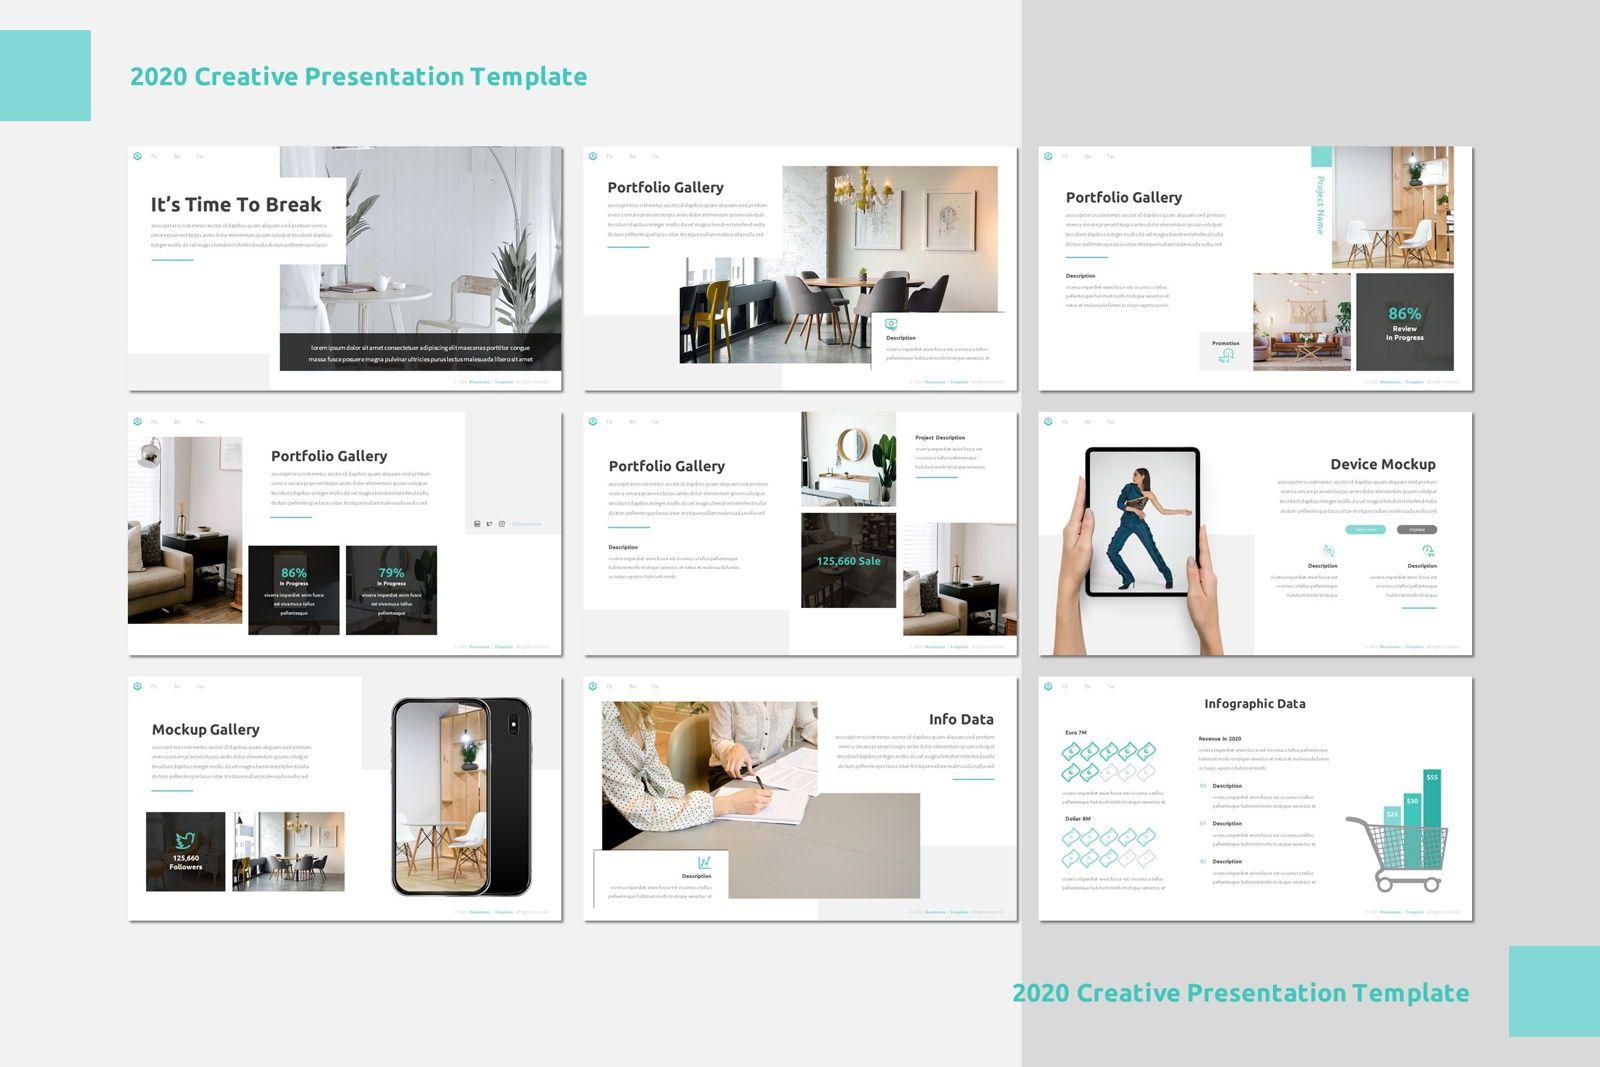 Monatoma - Powerpoint Template, Slide 4, 07779, Presentation Templates — PoweredTemplate.com